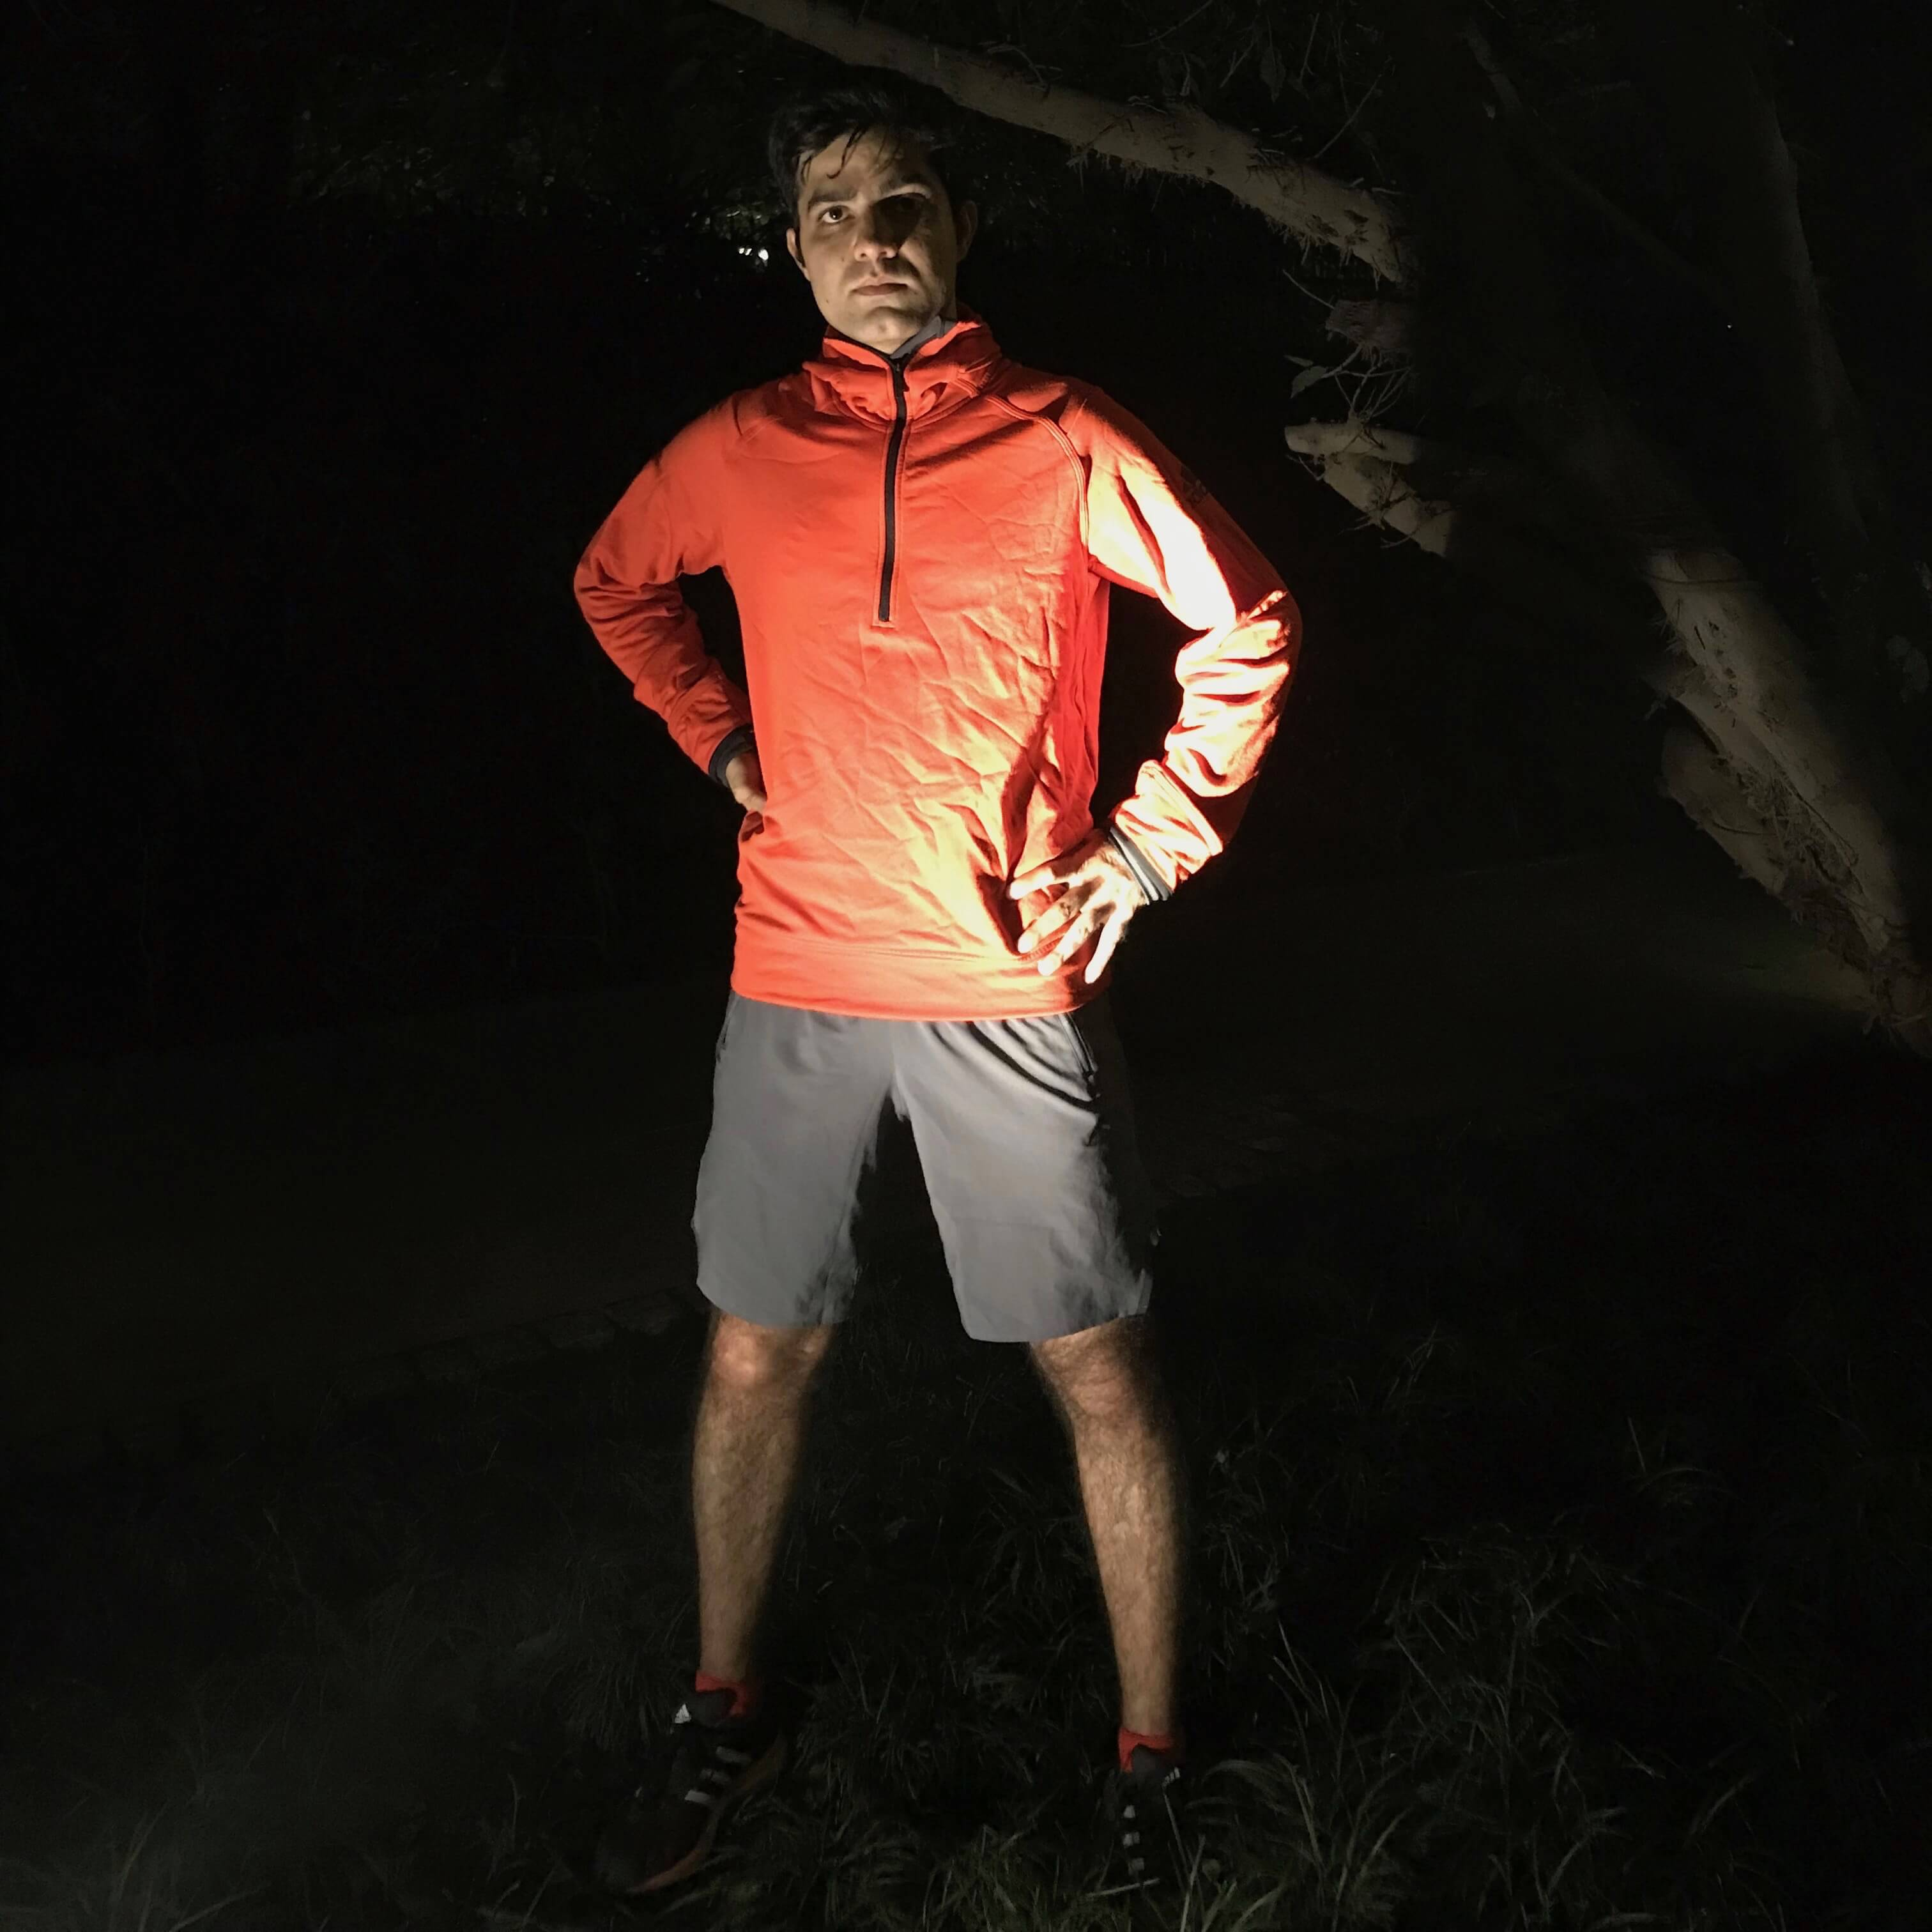 A man posing for the camera after his run at night